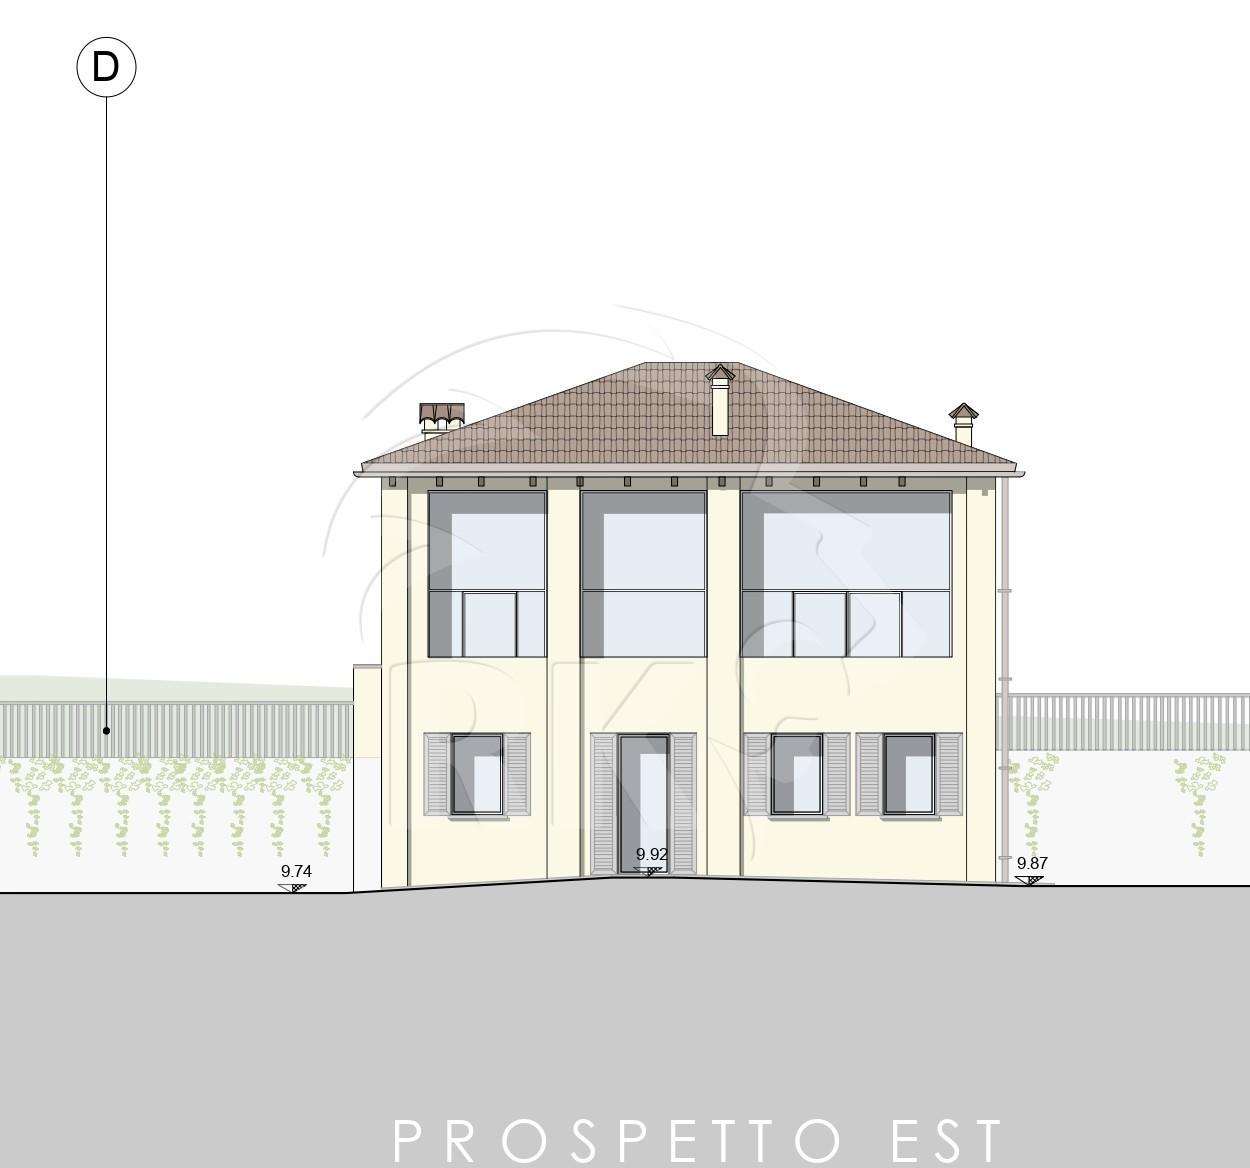 bologna vendita quart:  realkasa - agenzia immobiliare